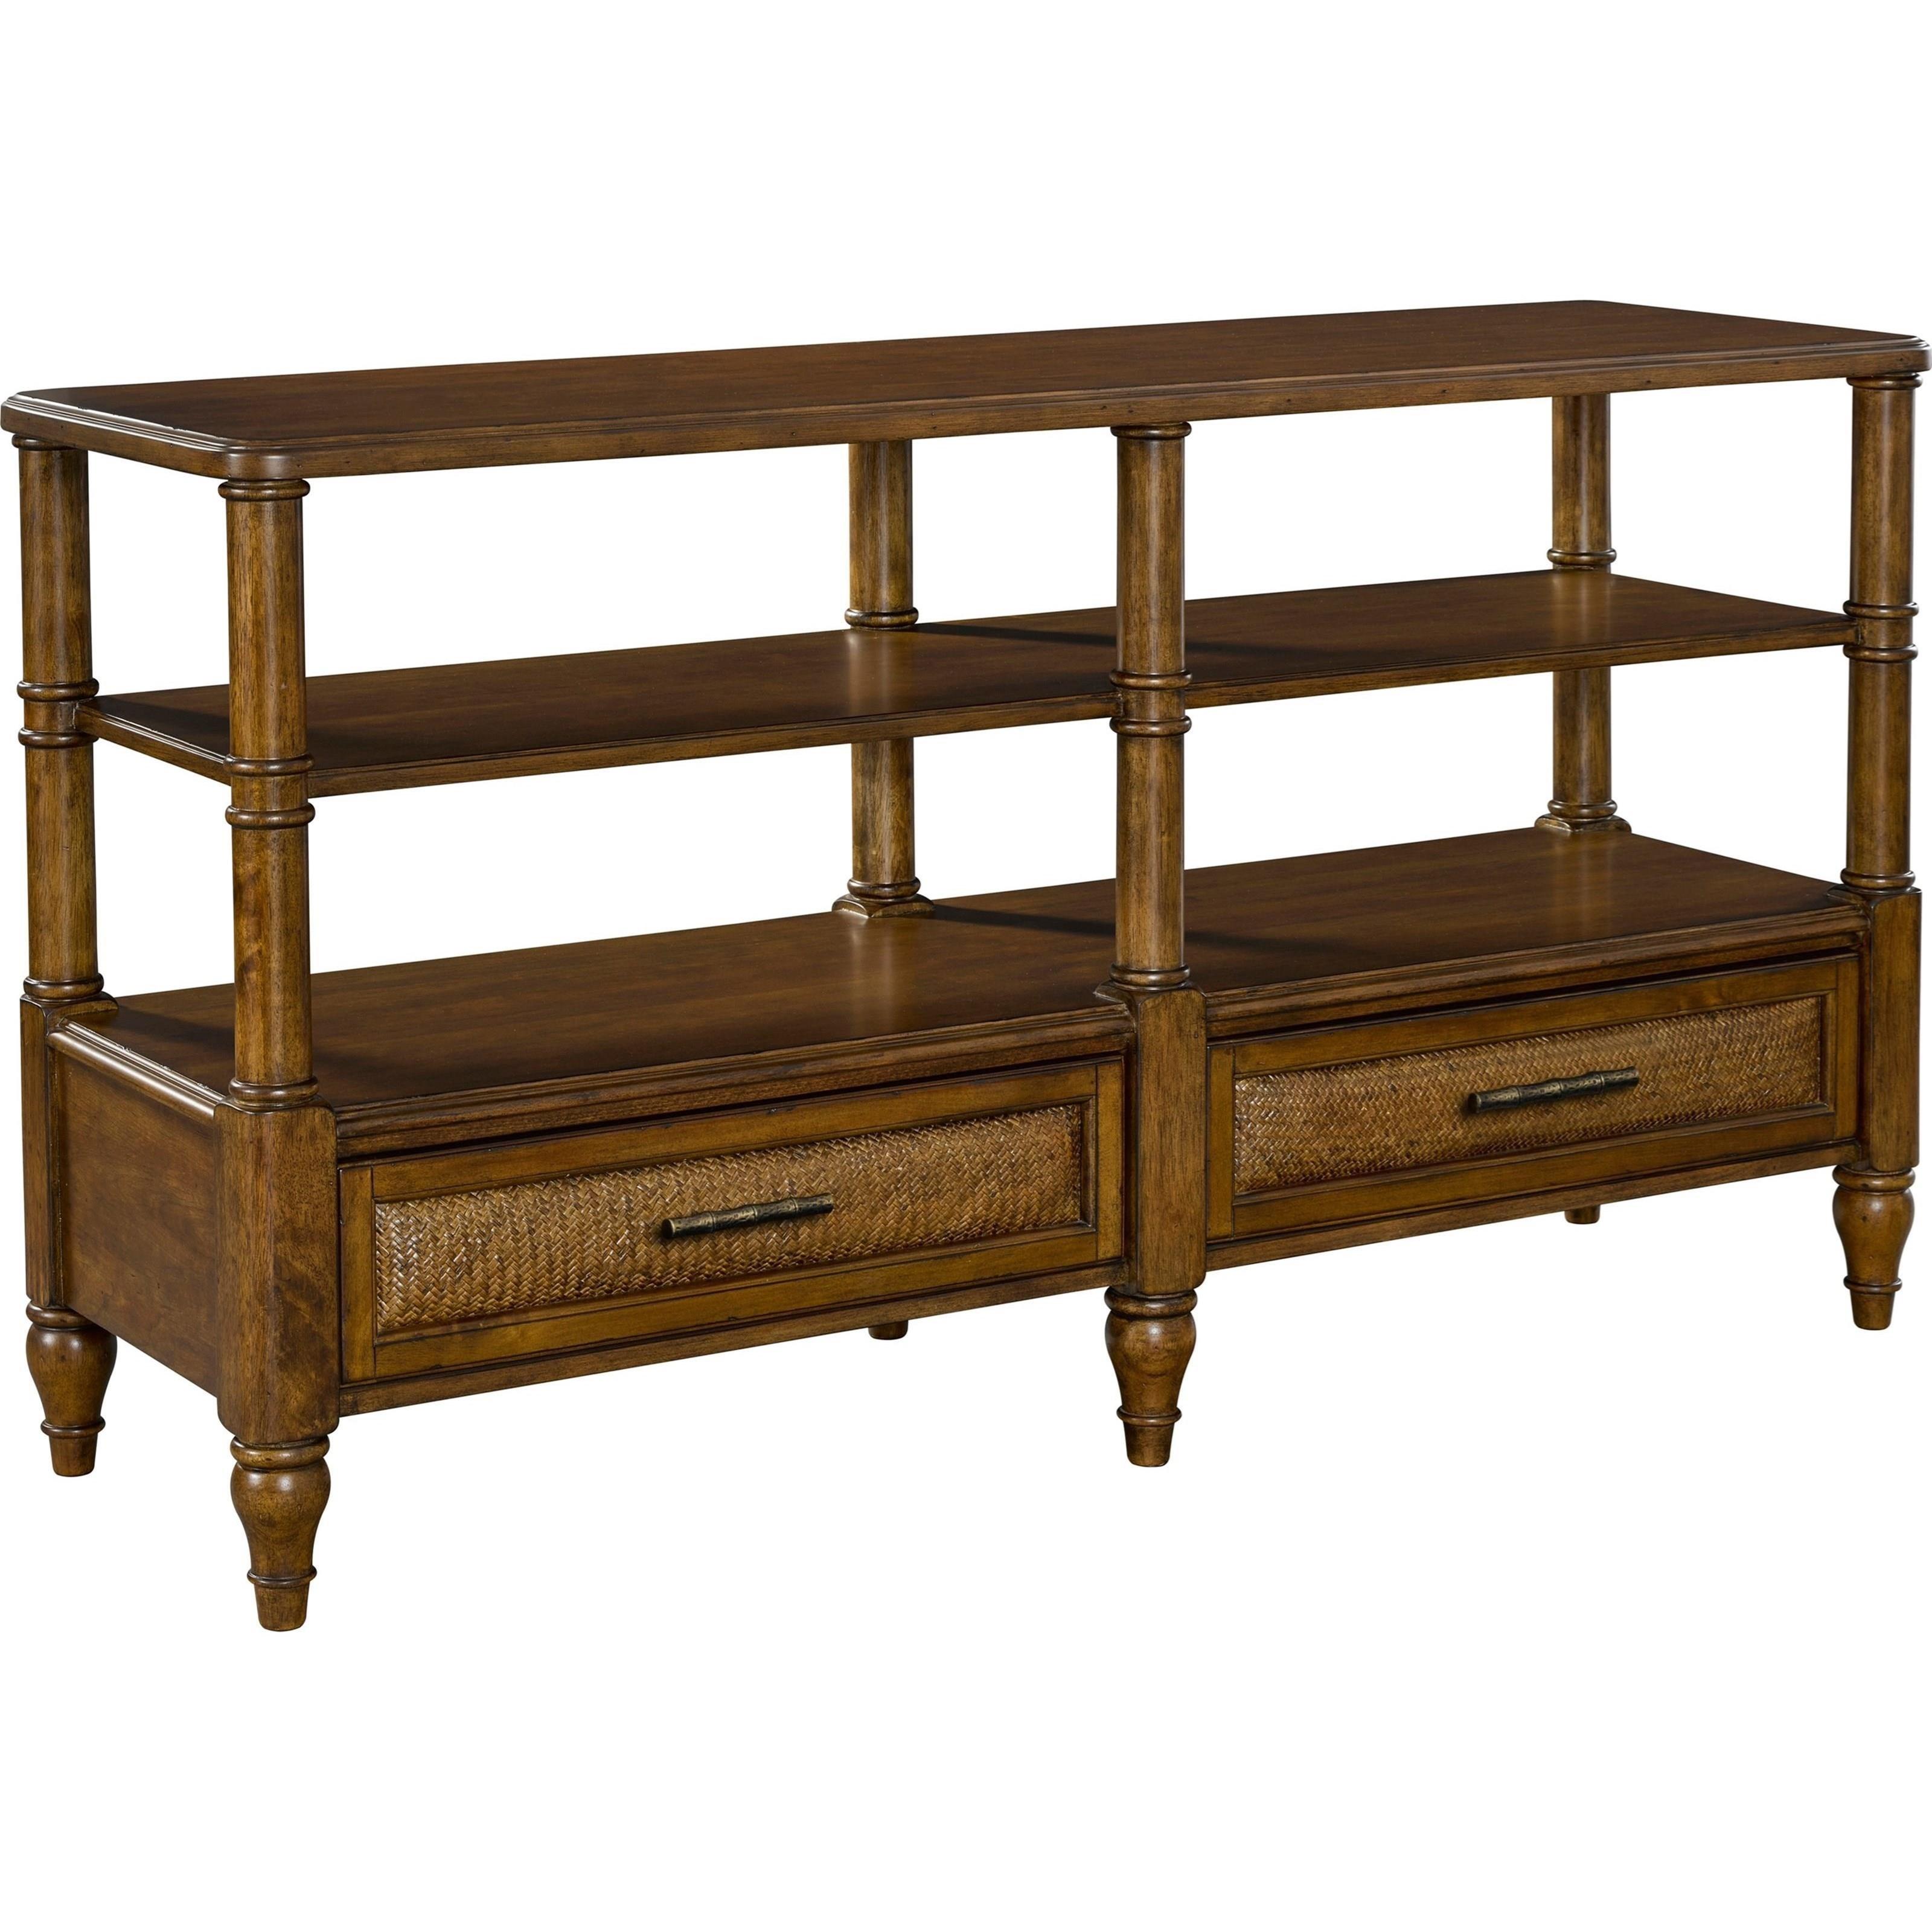 Broyhill Furniture Amalie Bay 4548 009 SofaConsole Table